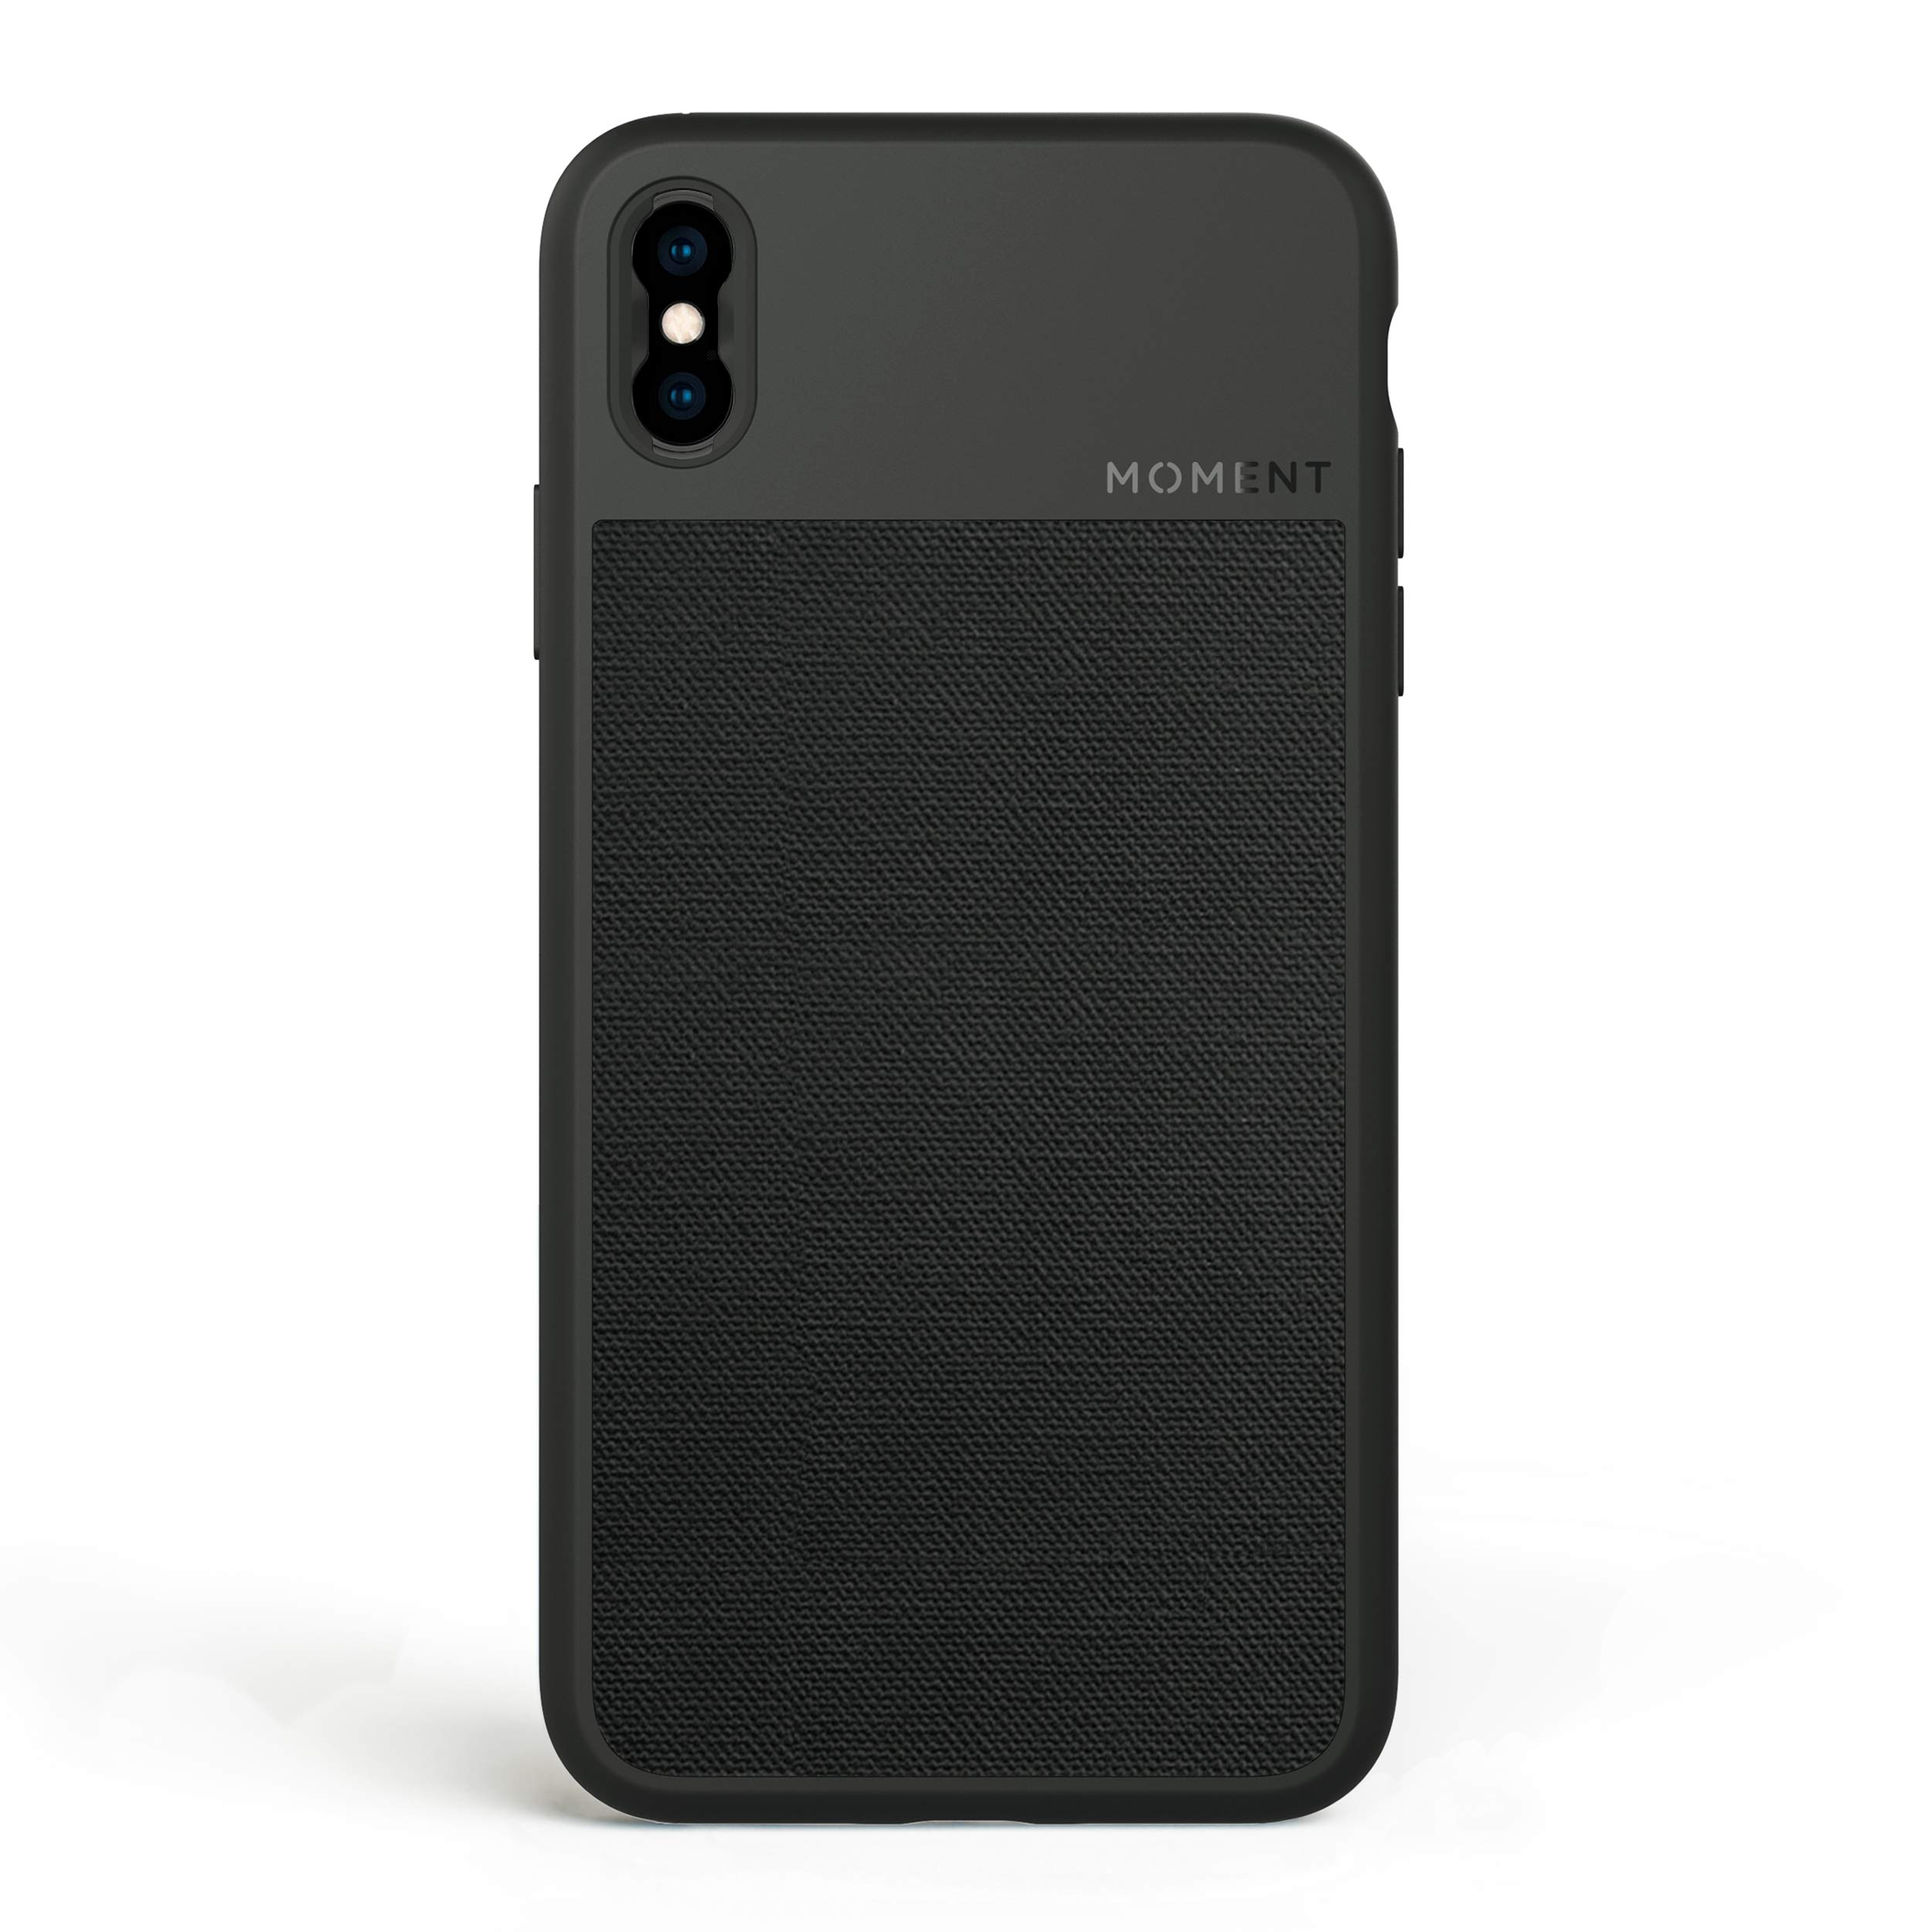 ویکالا · خرید  اصل اورجینال · خرید از آمازون · Moment iPhone Xs Case Photo Case in Black Canvas - Thin, Protective, Wrist Strap Friendly case for Camera Lovers. wekala · ویکالا